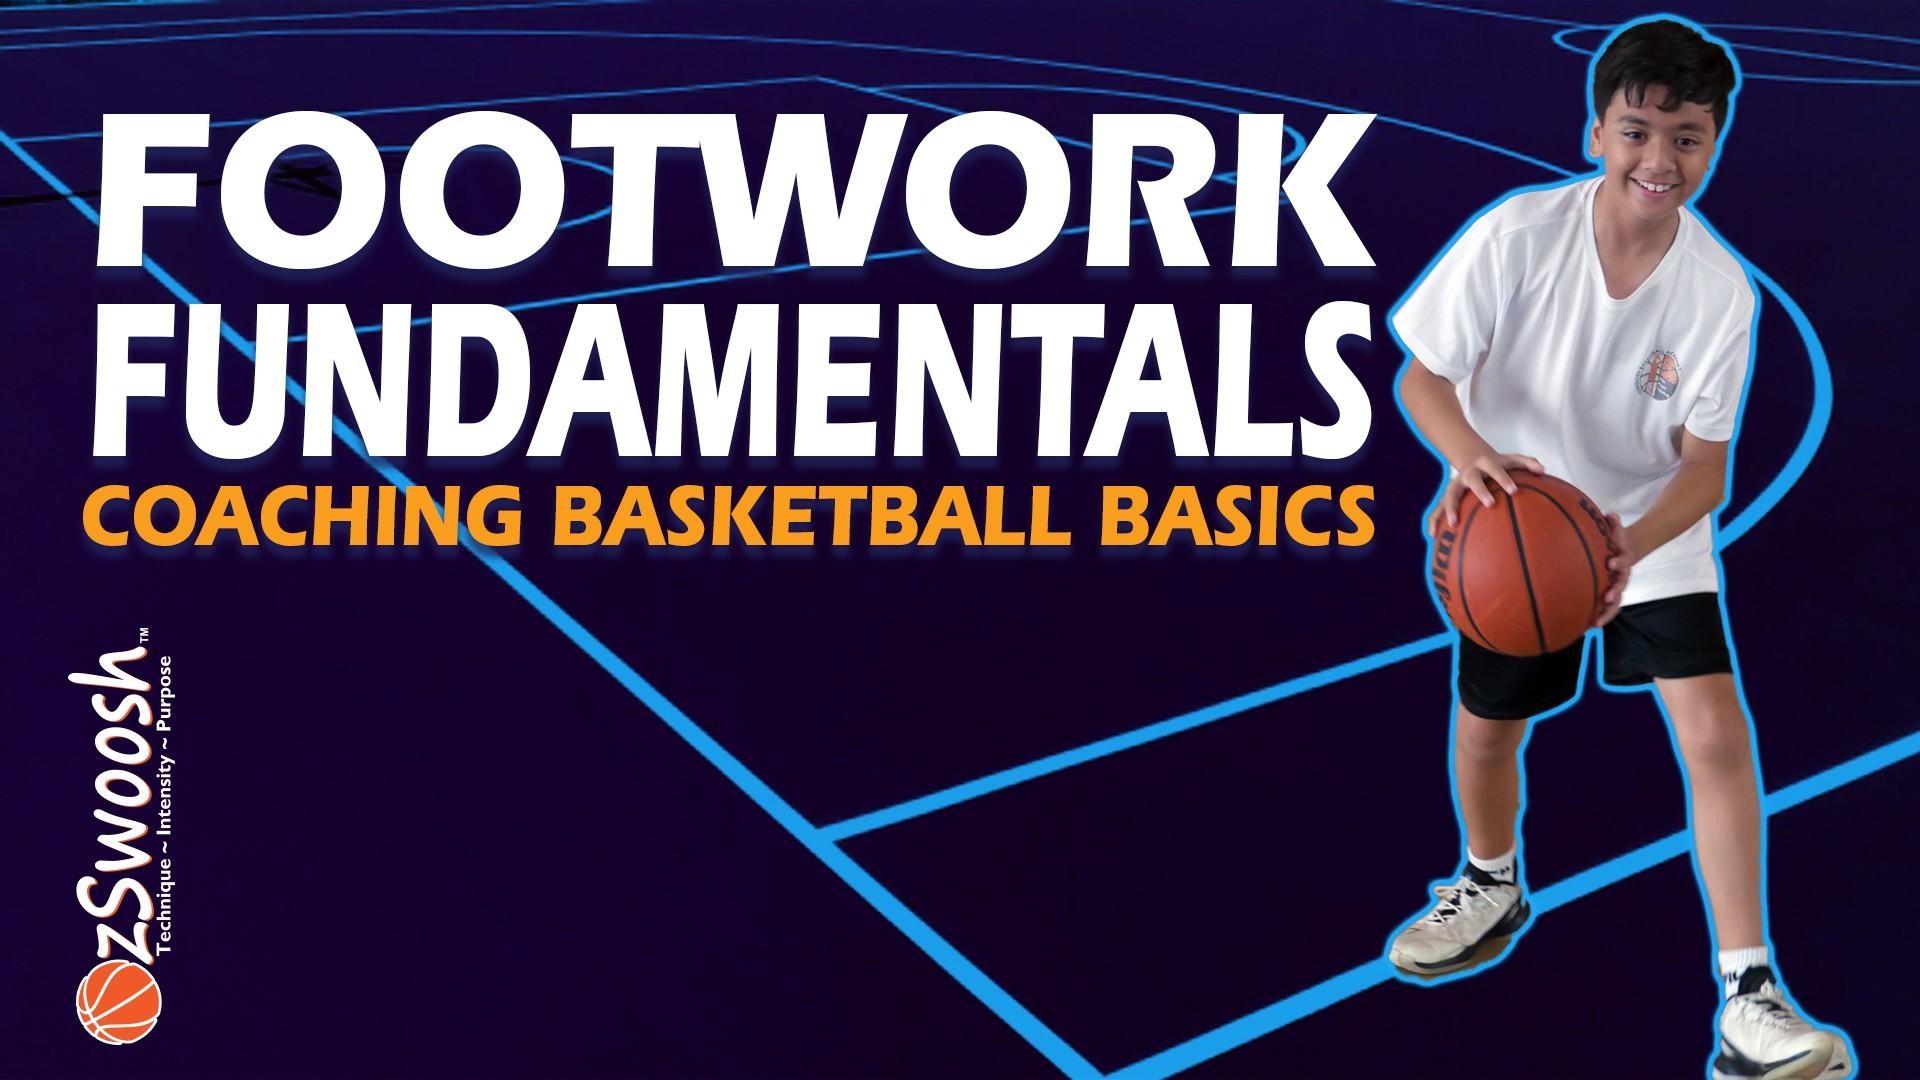 Basketball Footwork Fundamentals - Coaching Basketball Fundamentals